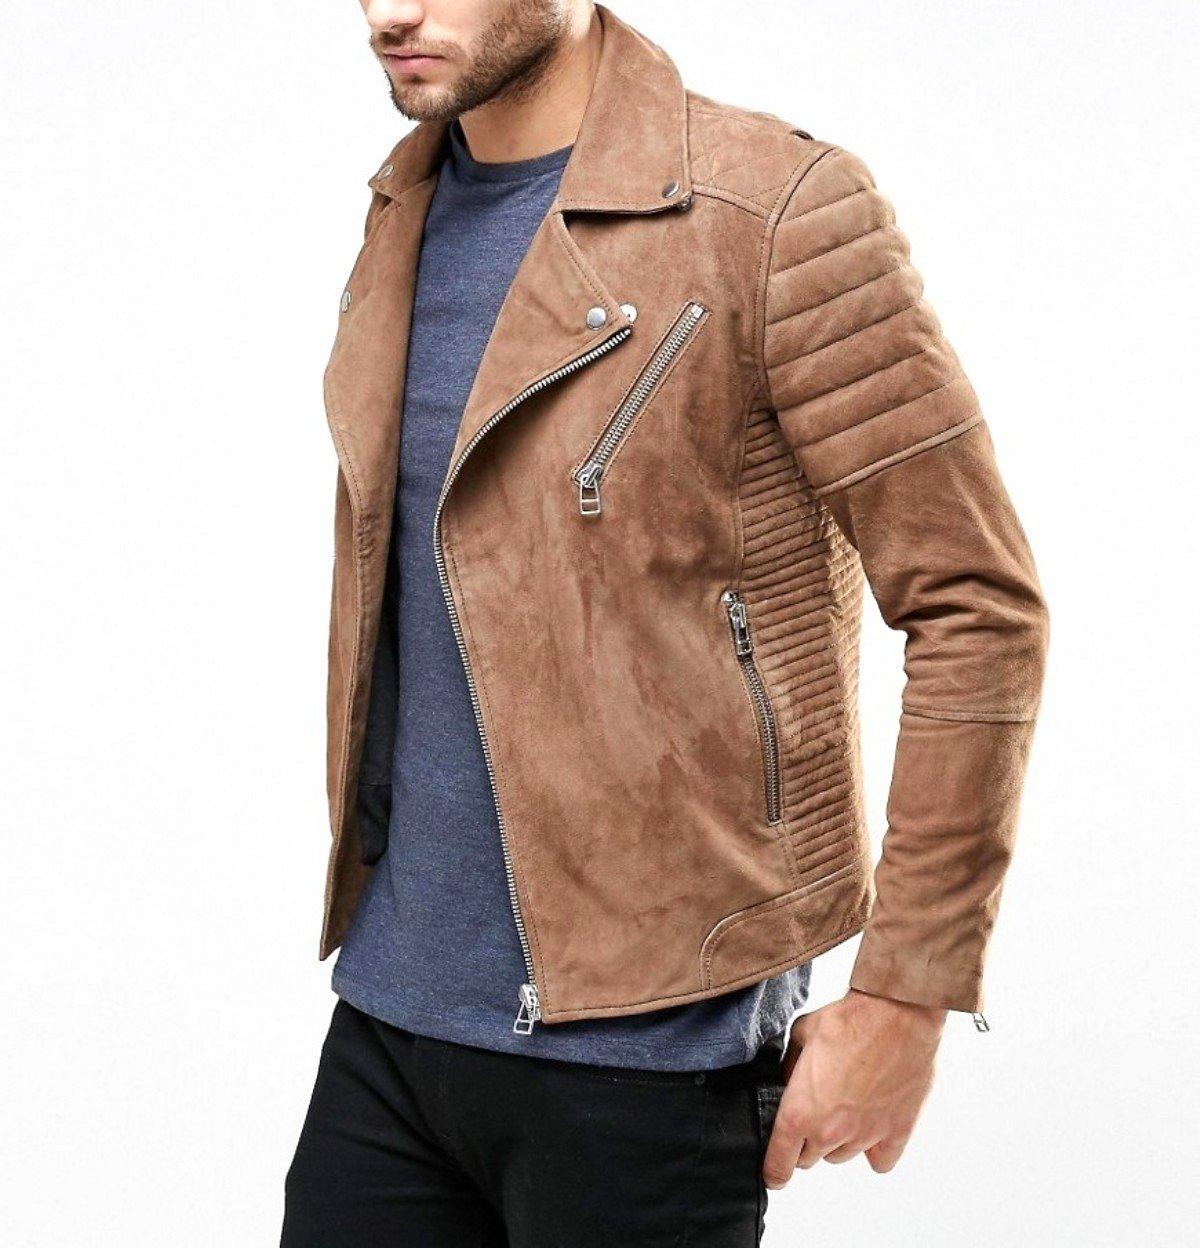 World Of Leather Genuine Lambskin Suede Leather Jacket Biker Light Brown Moto (XXL46)